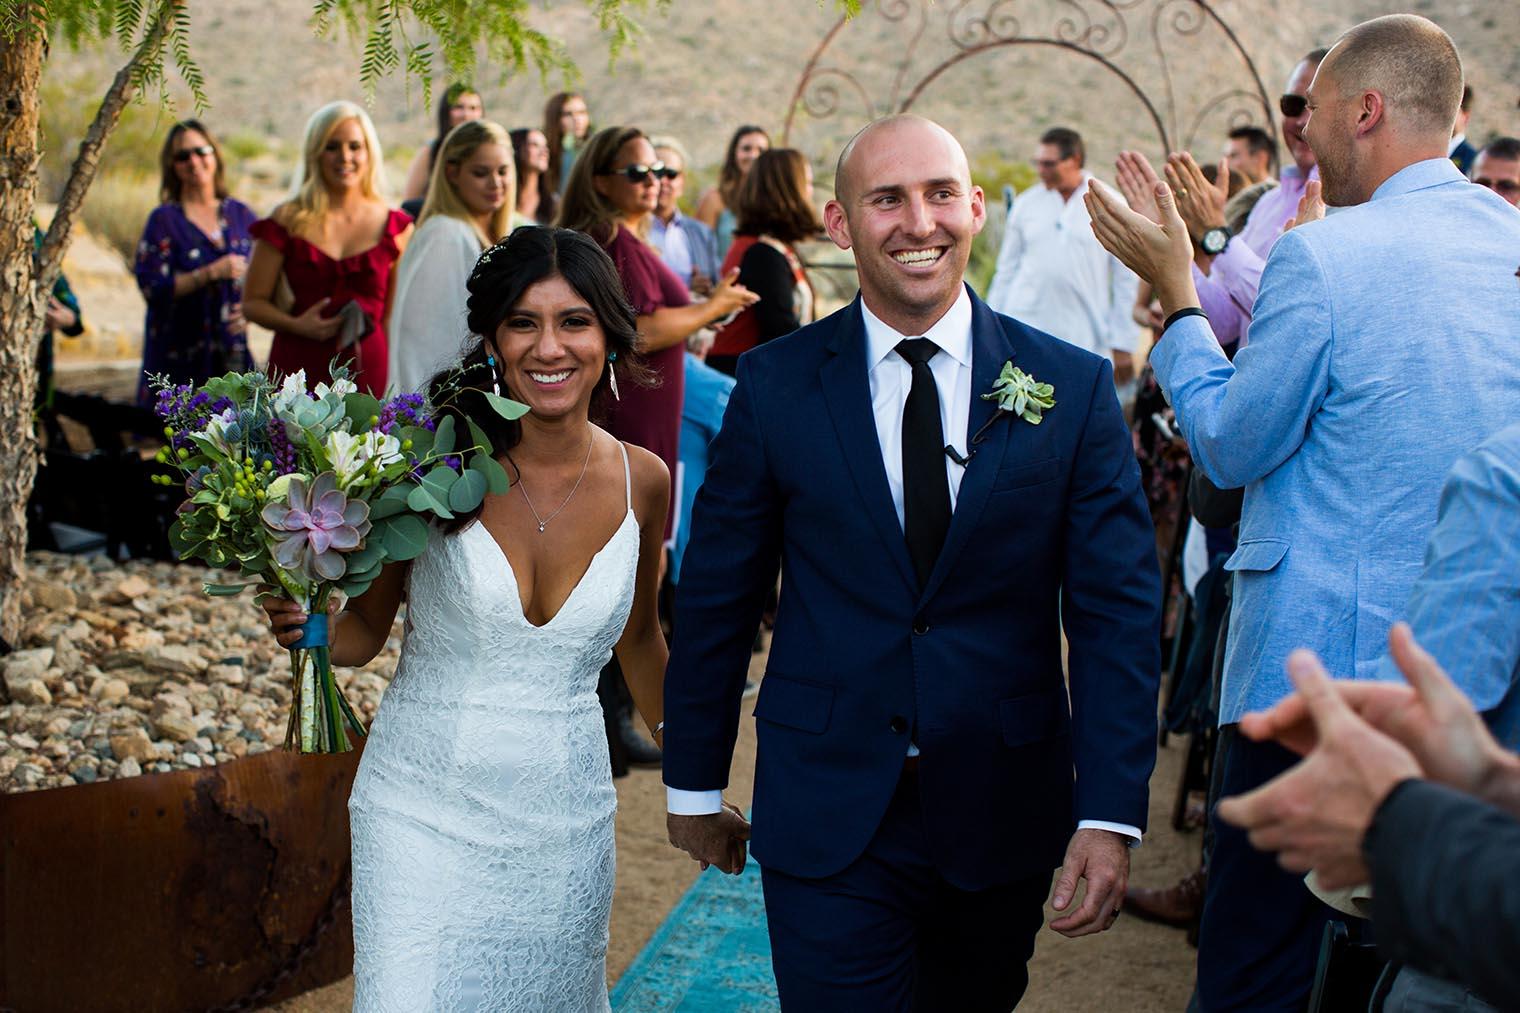 Sacred Sands Joshua Tree Wedding Ceremony 80 Dustin Cantrell